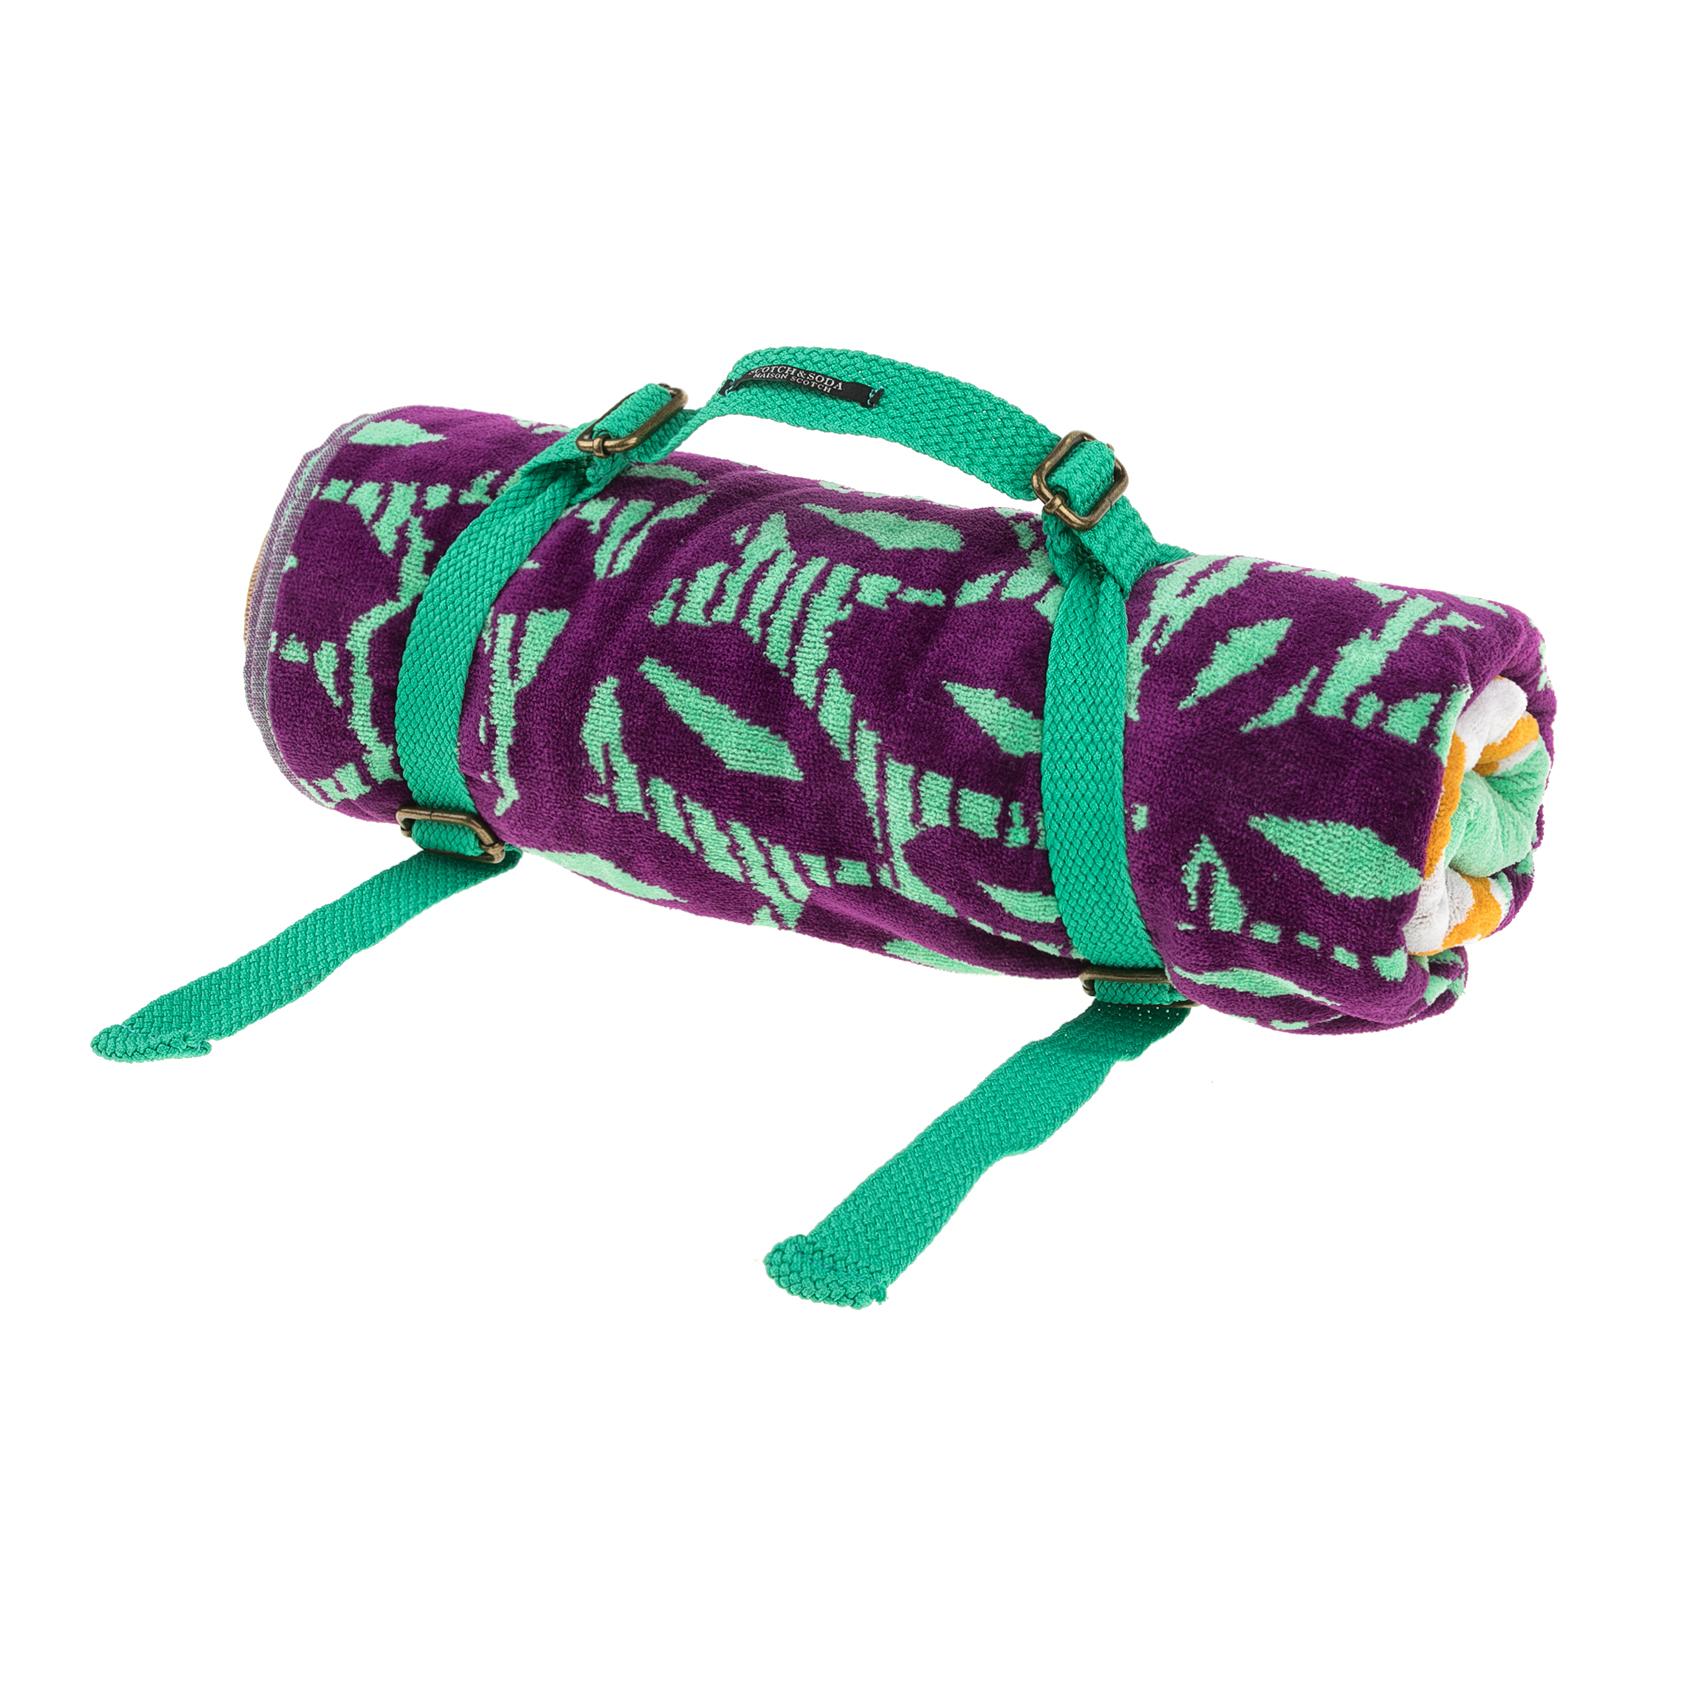 SCOTCH & SODA – Πετσέτα θαλάσσης SCOTCH & SODA μοβ-πράσινη